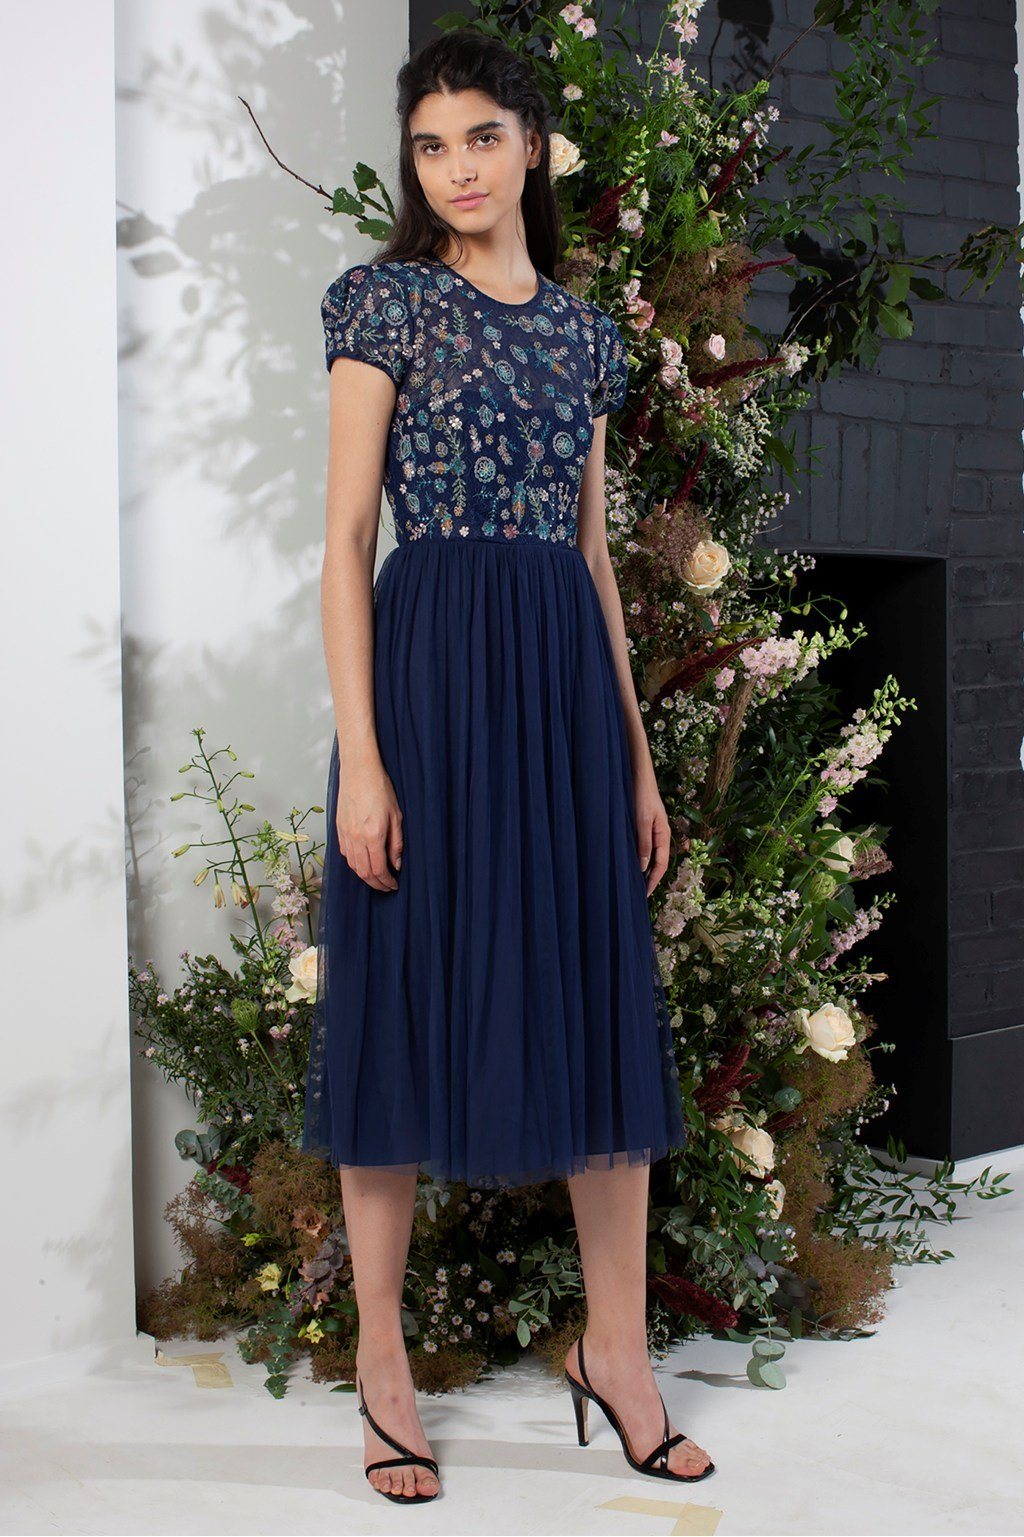 French Connection Diya Lace Mix Bridesmaid Dress Navy Blue